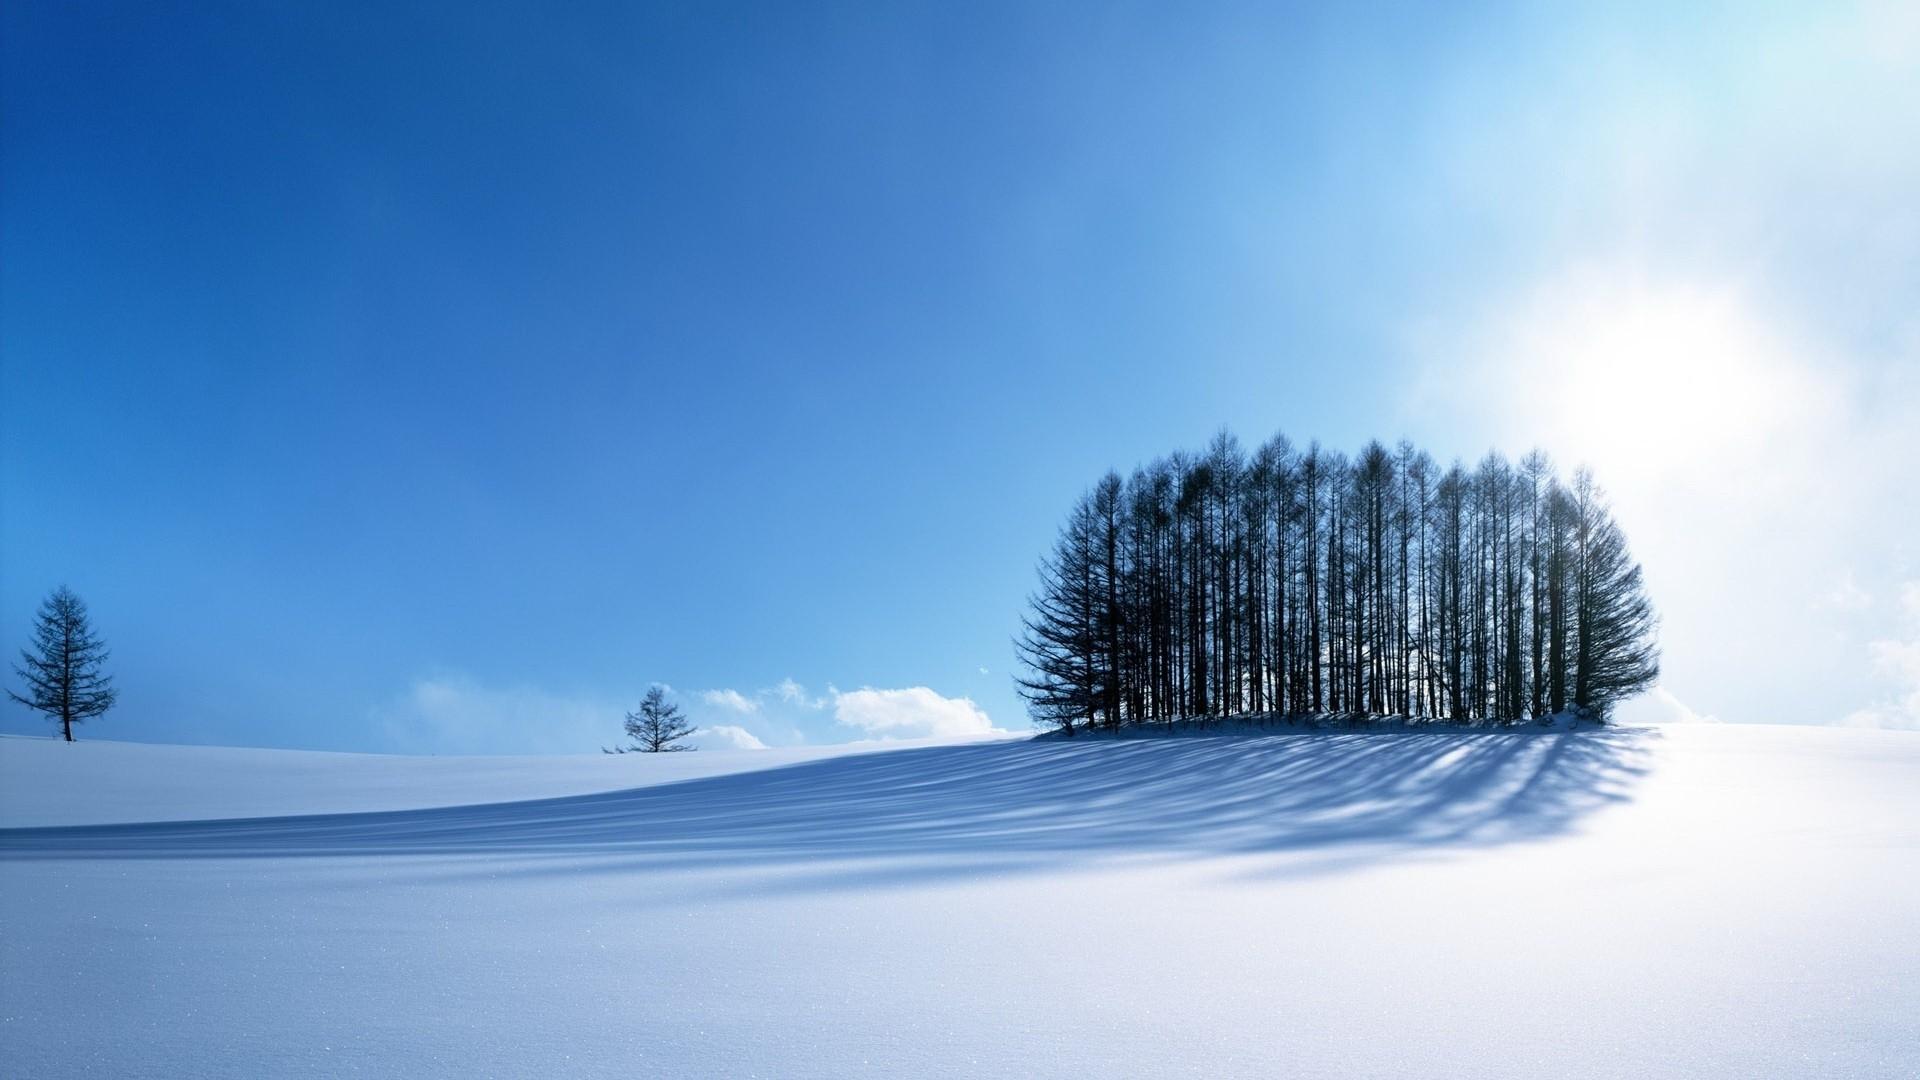 Cold Full HD Wallpaper